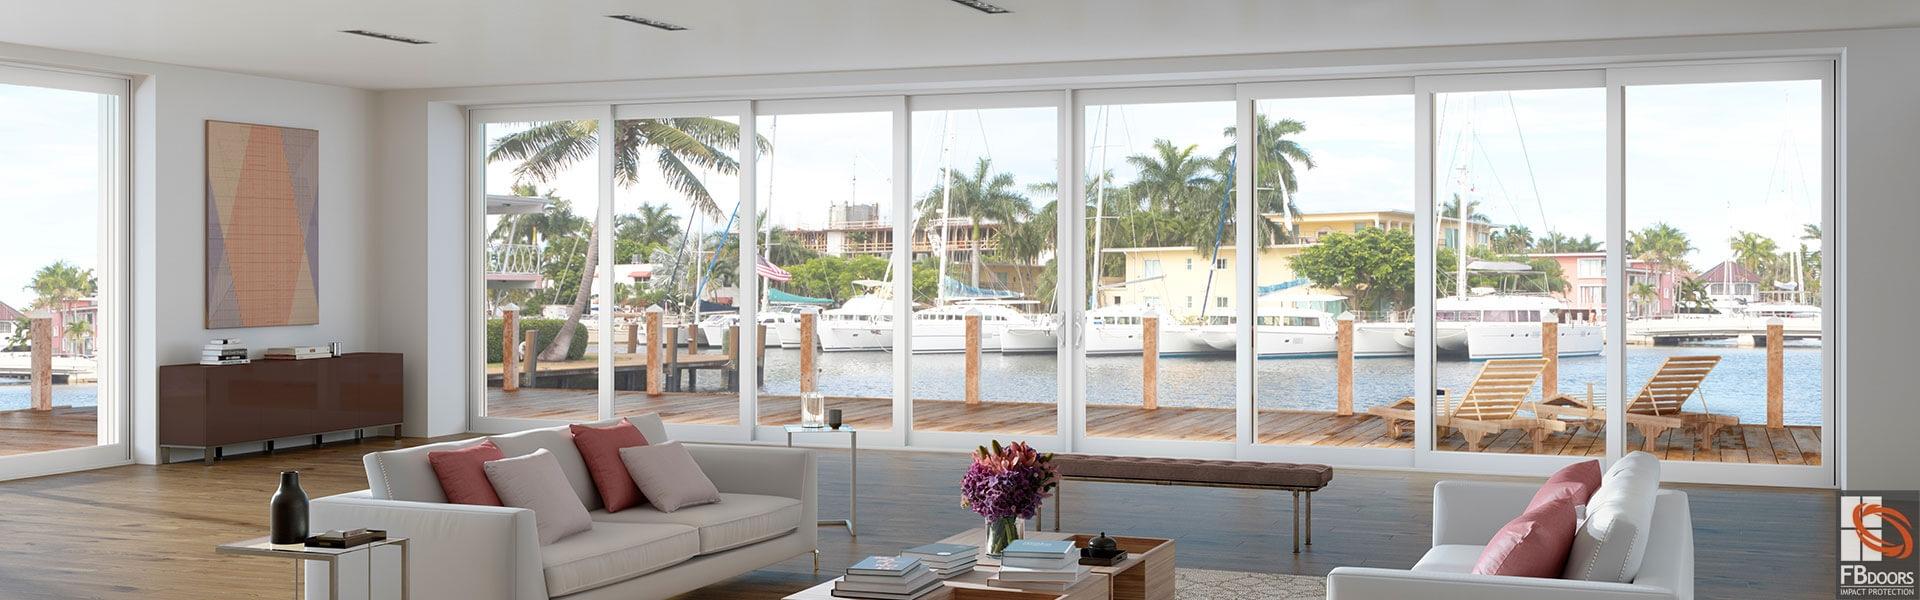 Best Hurricane Windows in Miami